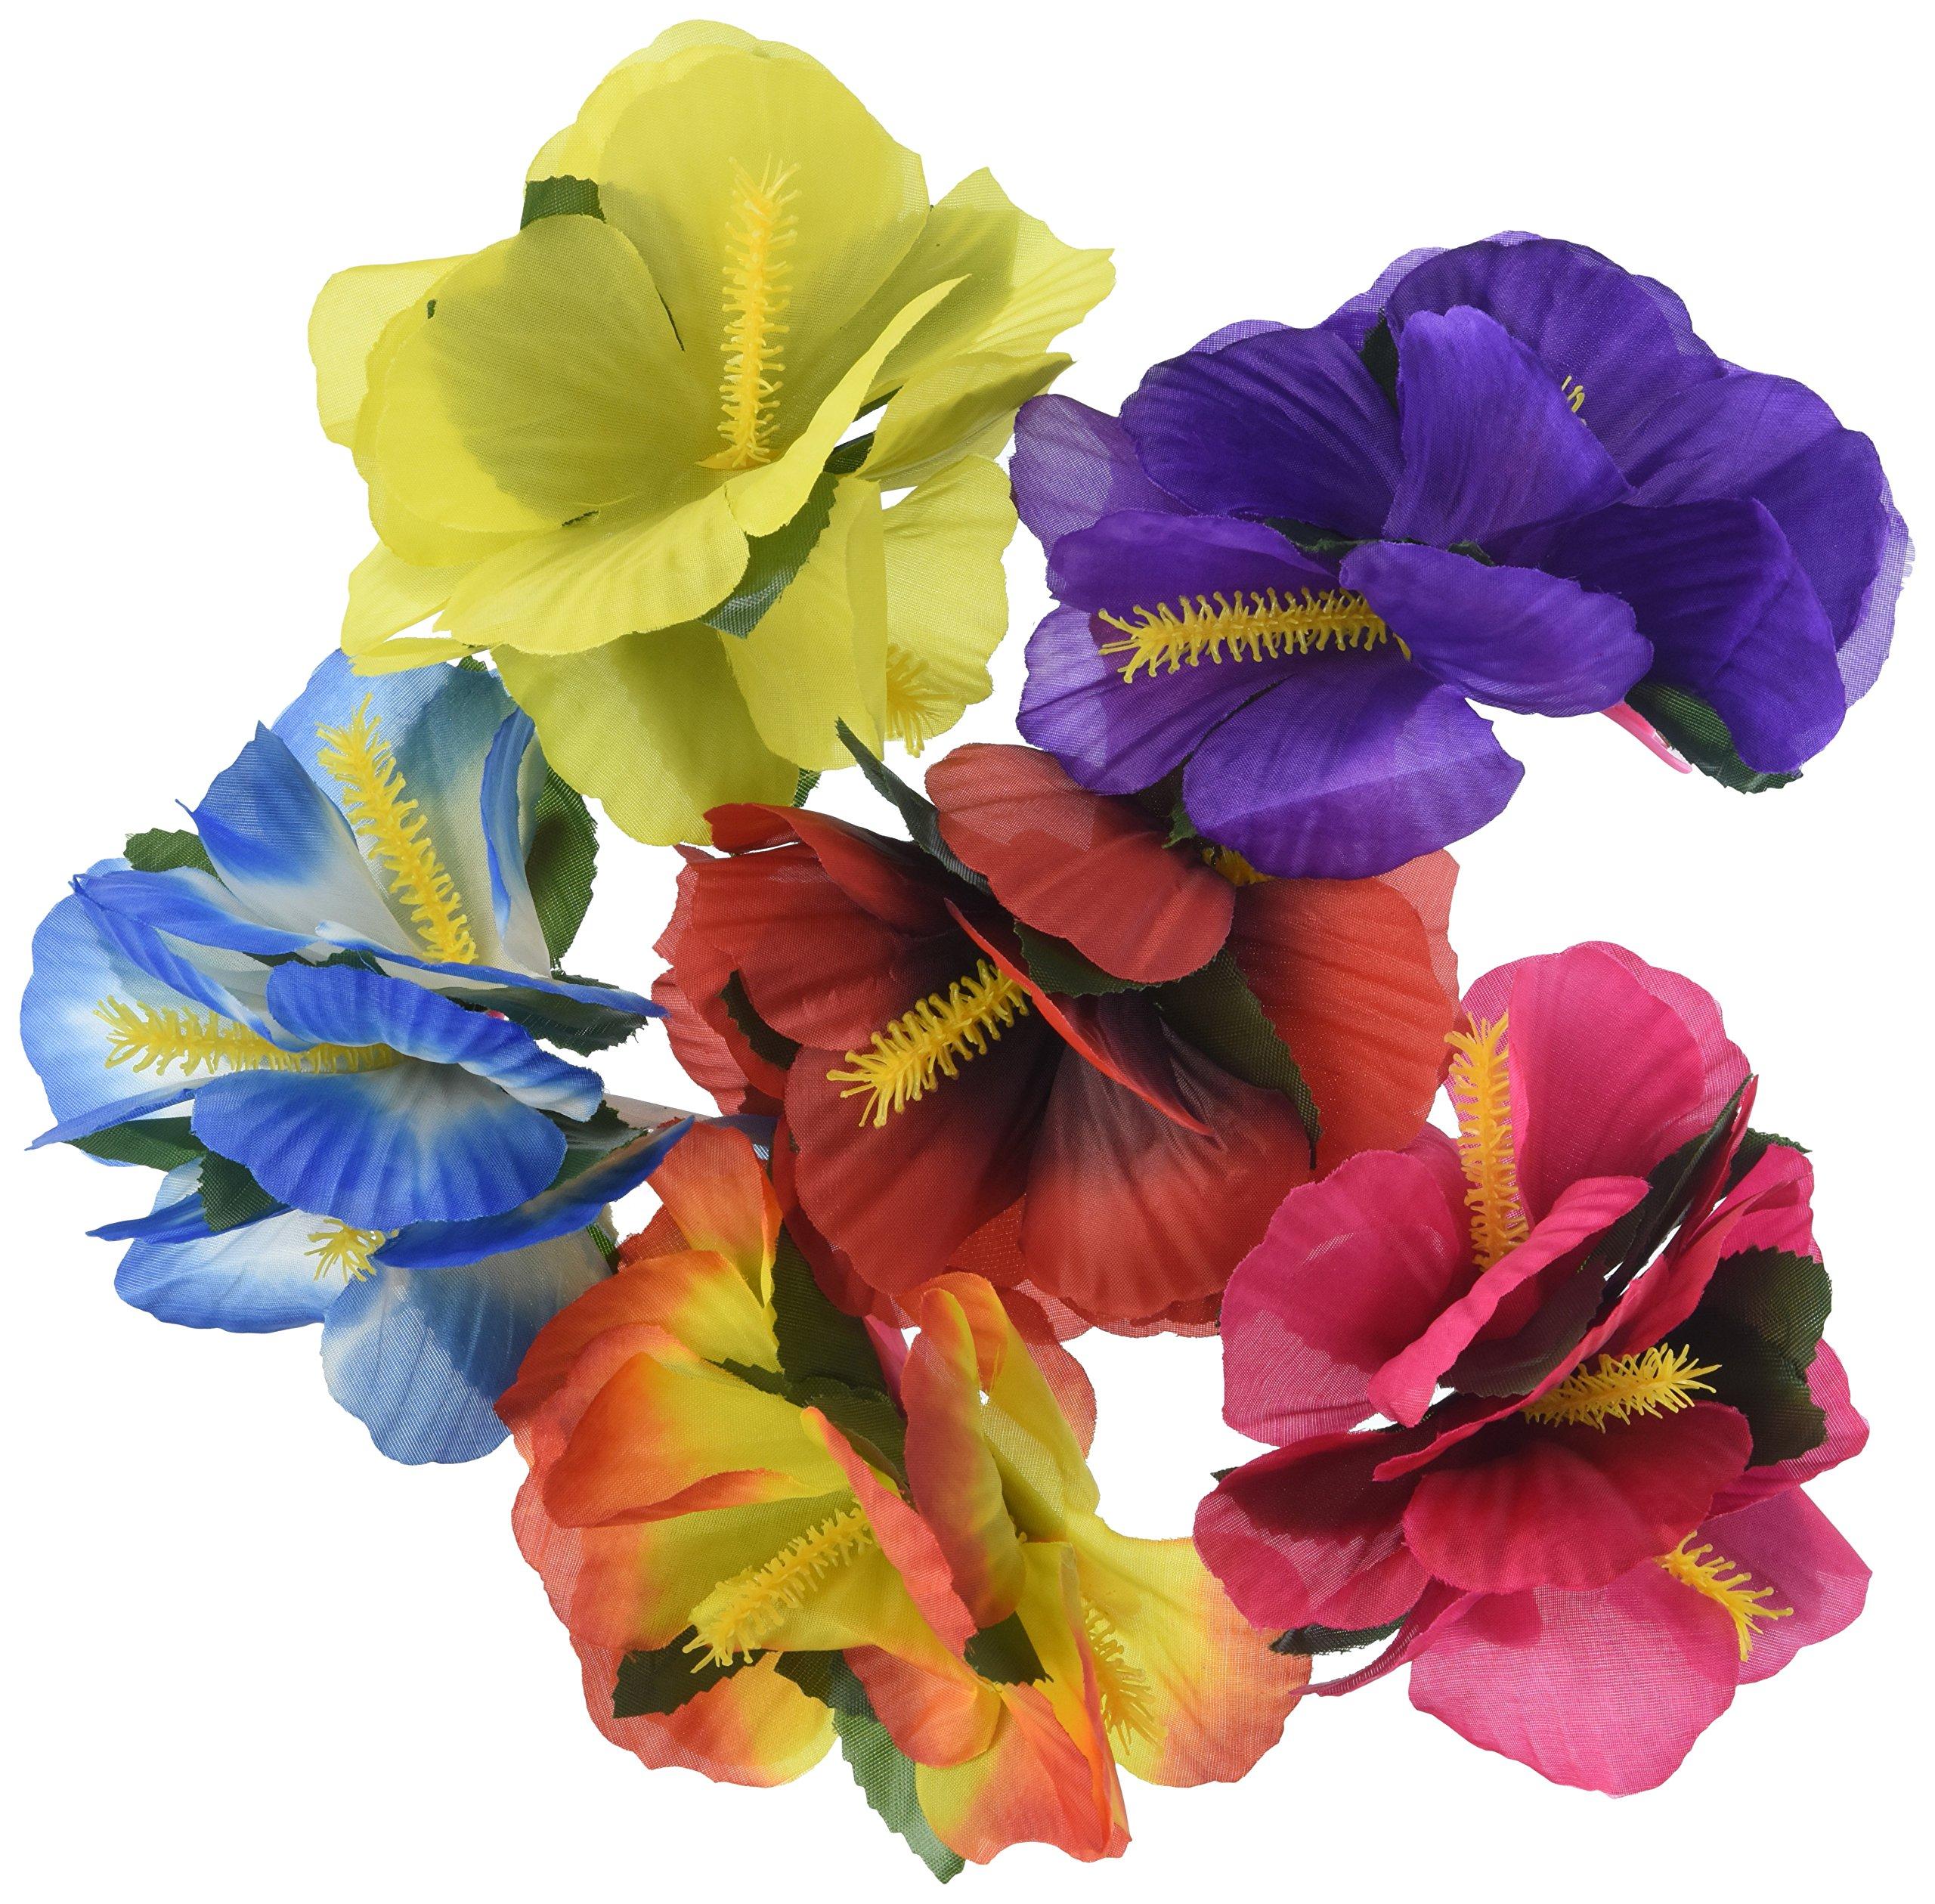 Amazon premium hawaiian luau party lei paradise petunia w hula girl hibiscus flower lei hair clips 12 izmirmasajfo